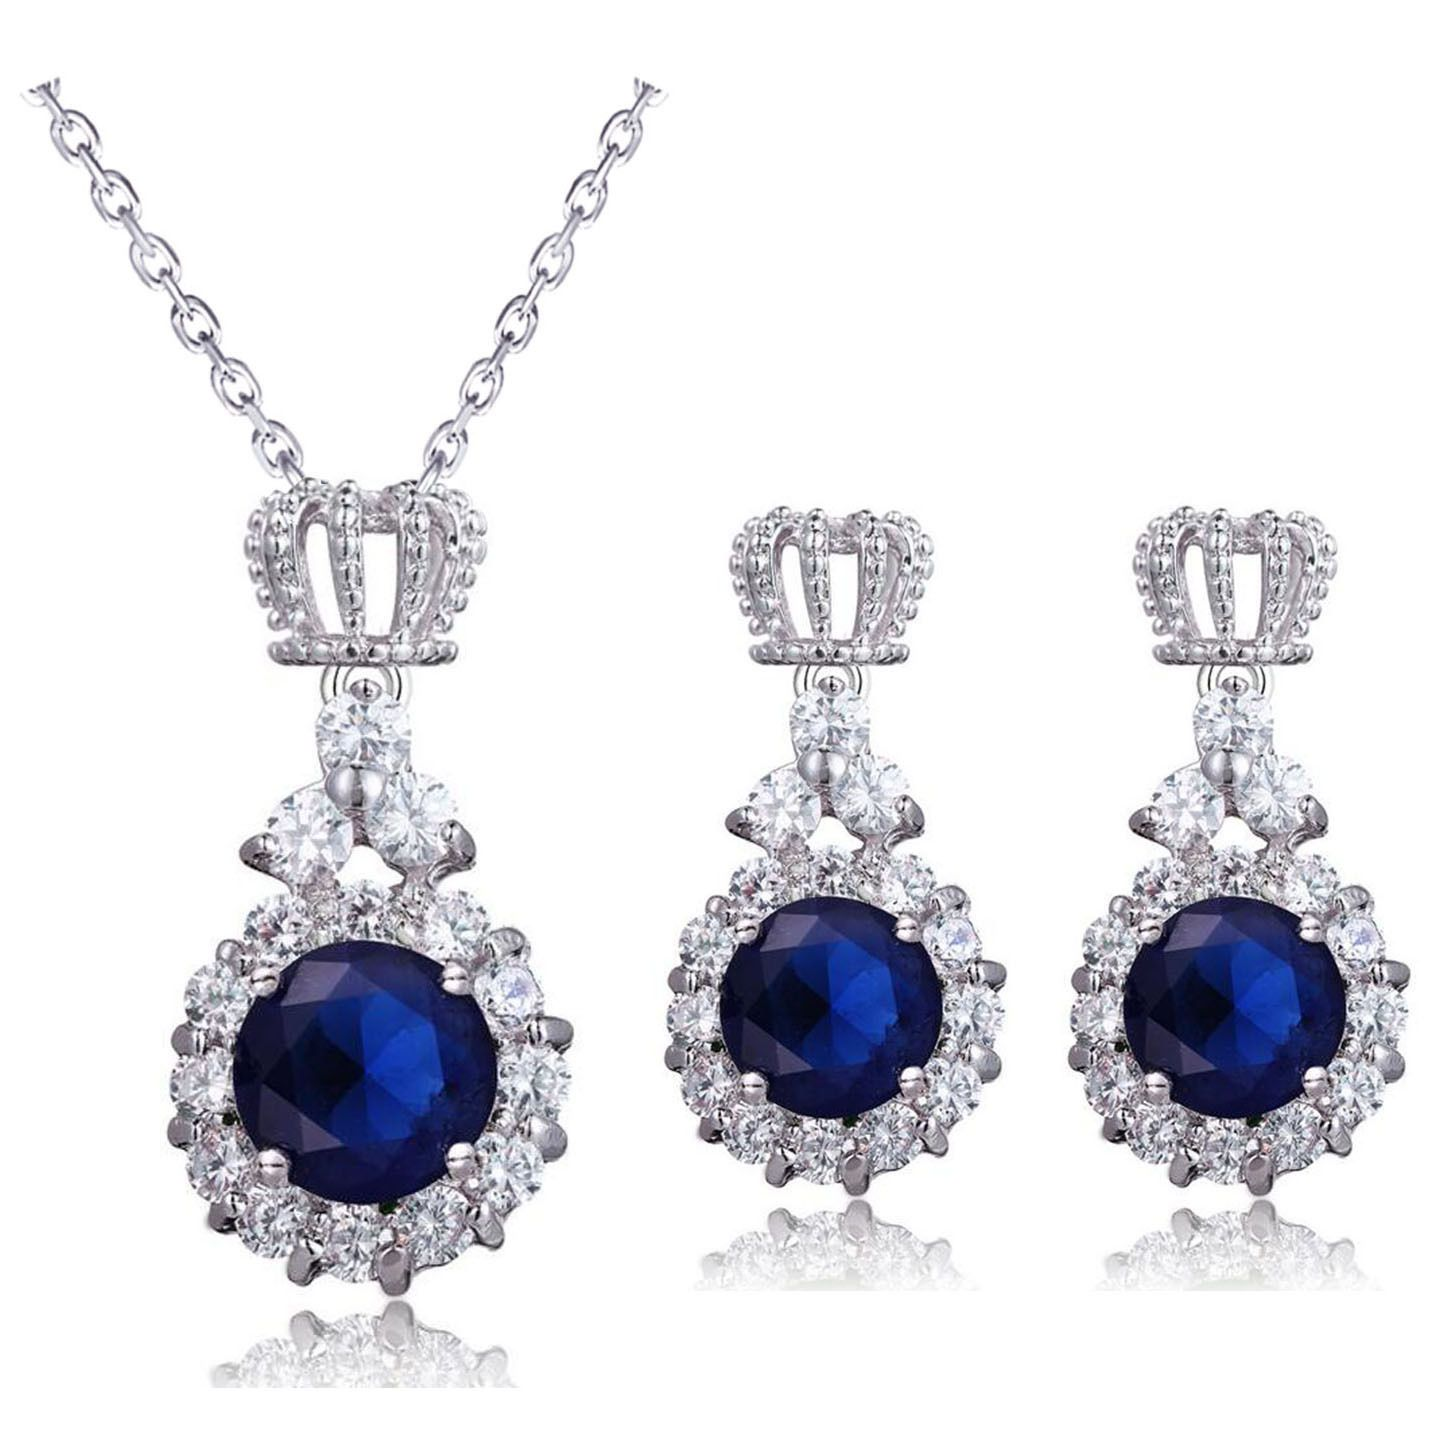 Luxury princess prom party evening crown jewellery set earrings